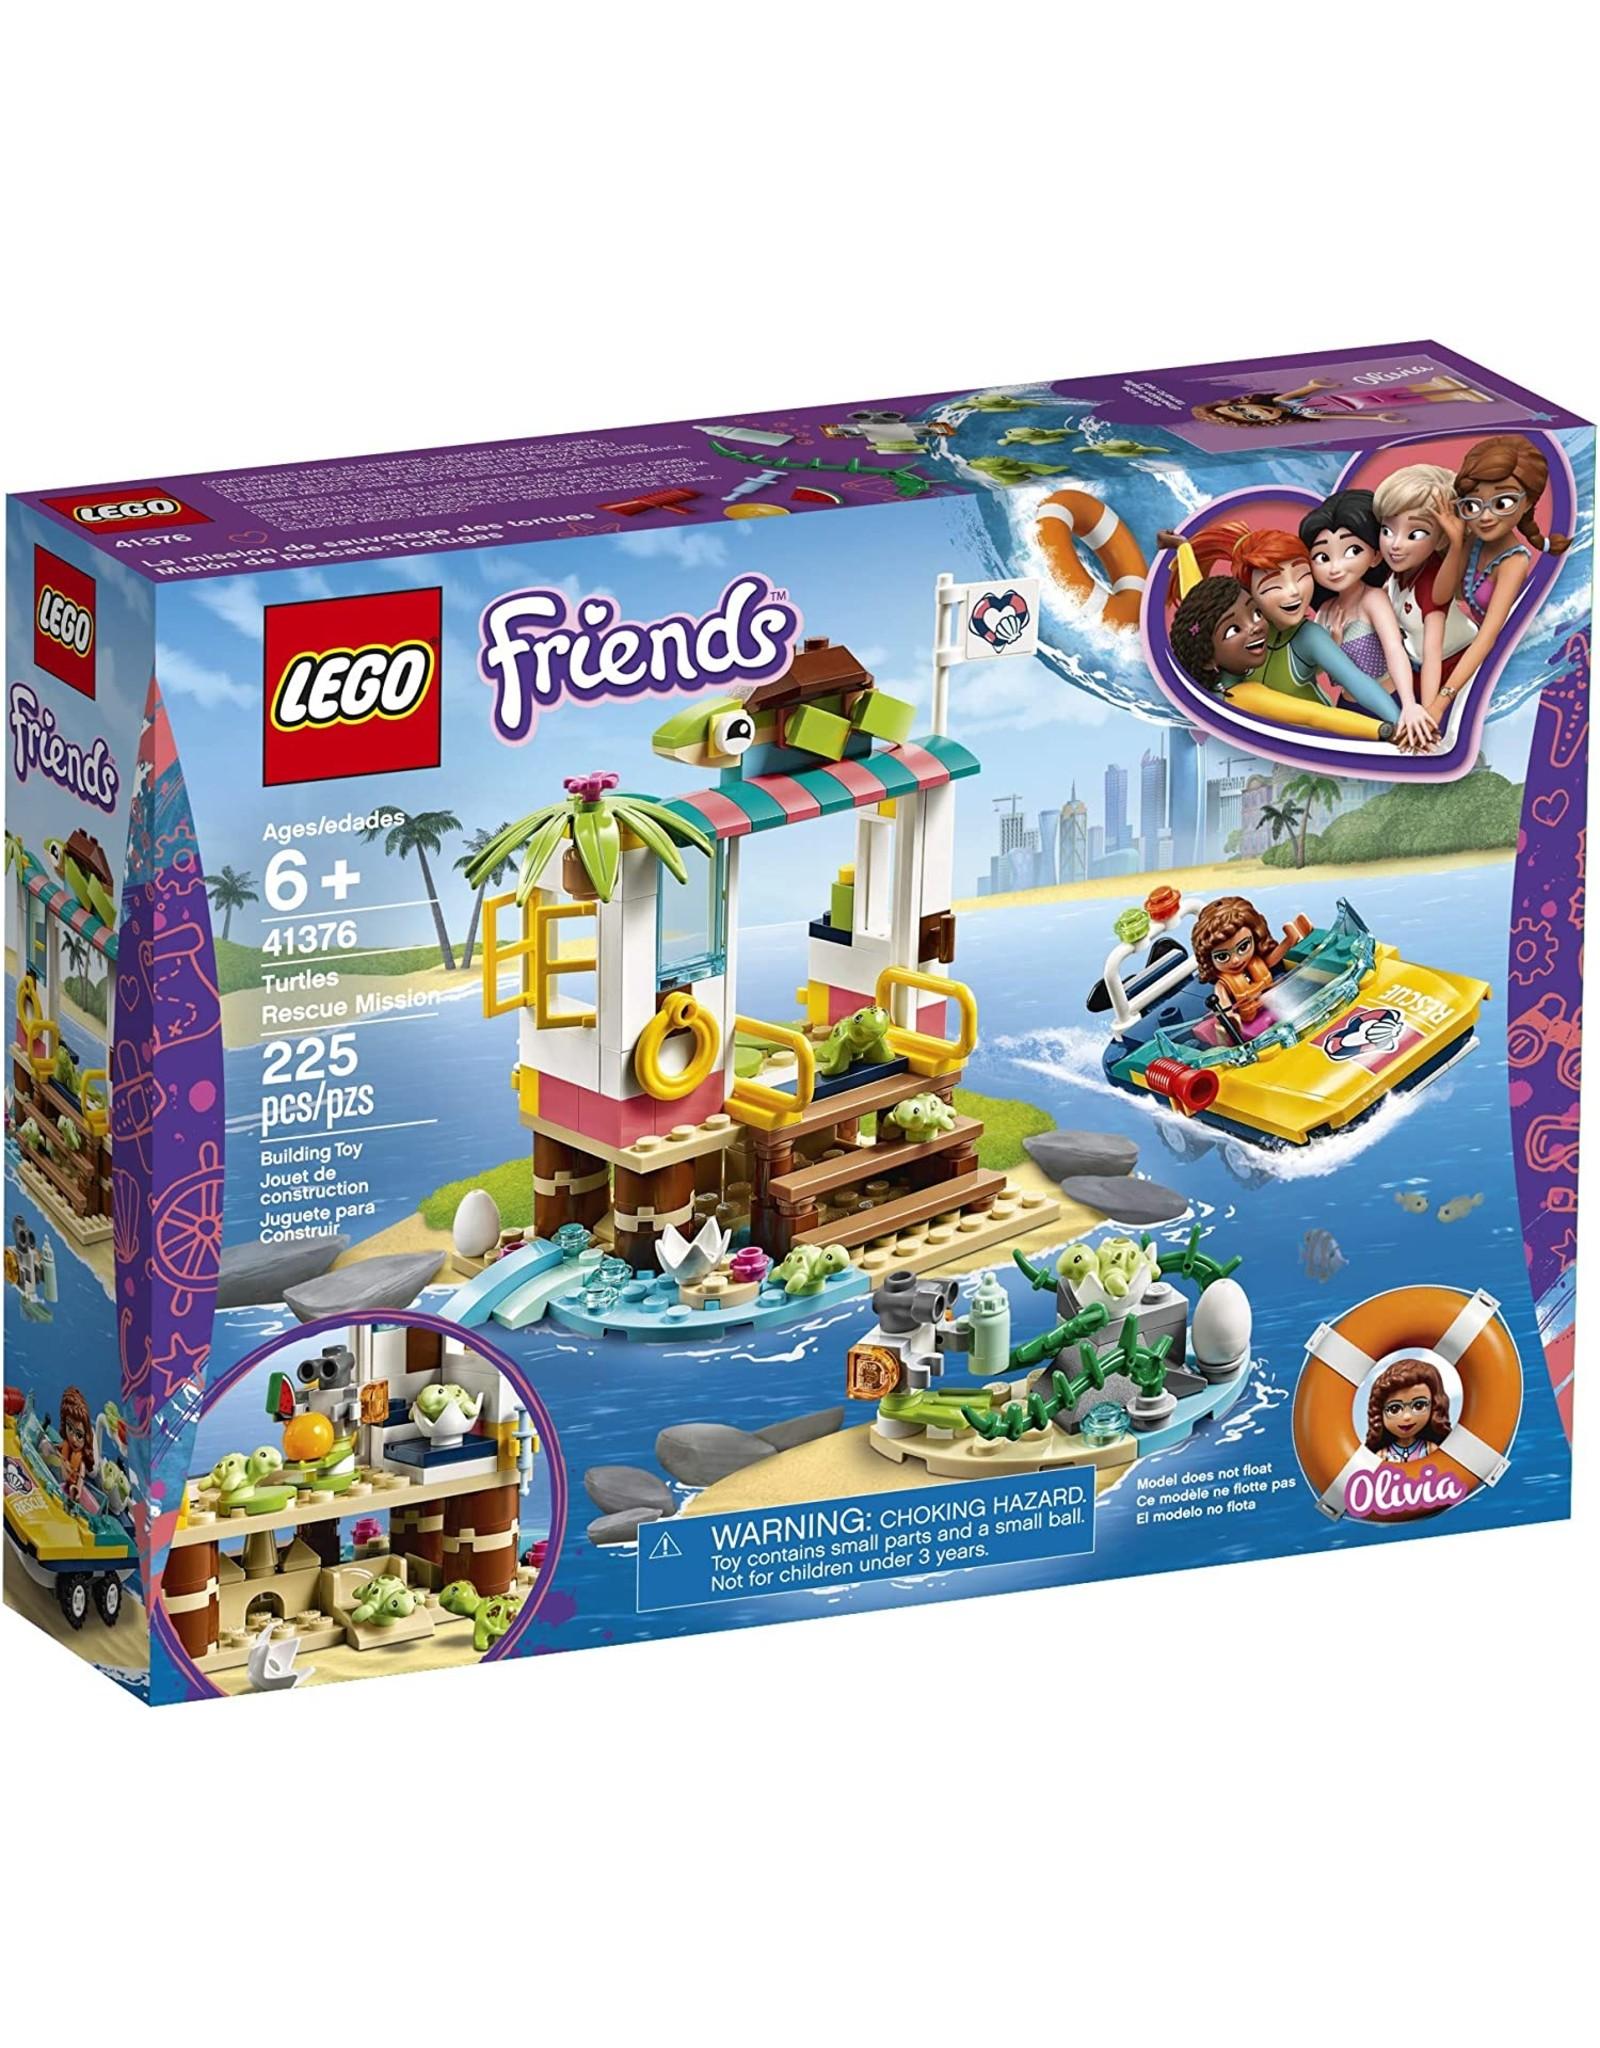 LEGO Friends Turtle Rescue Mission